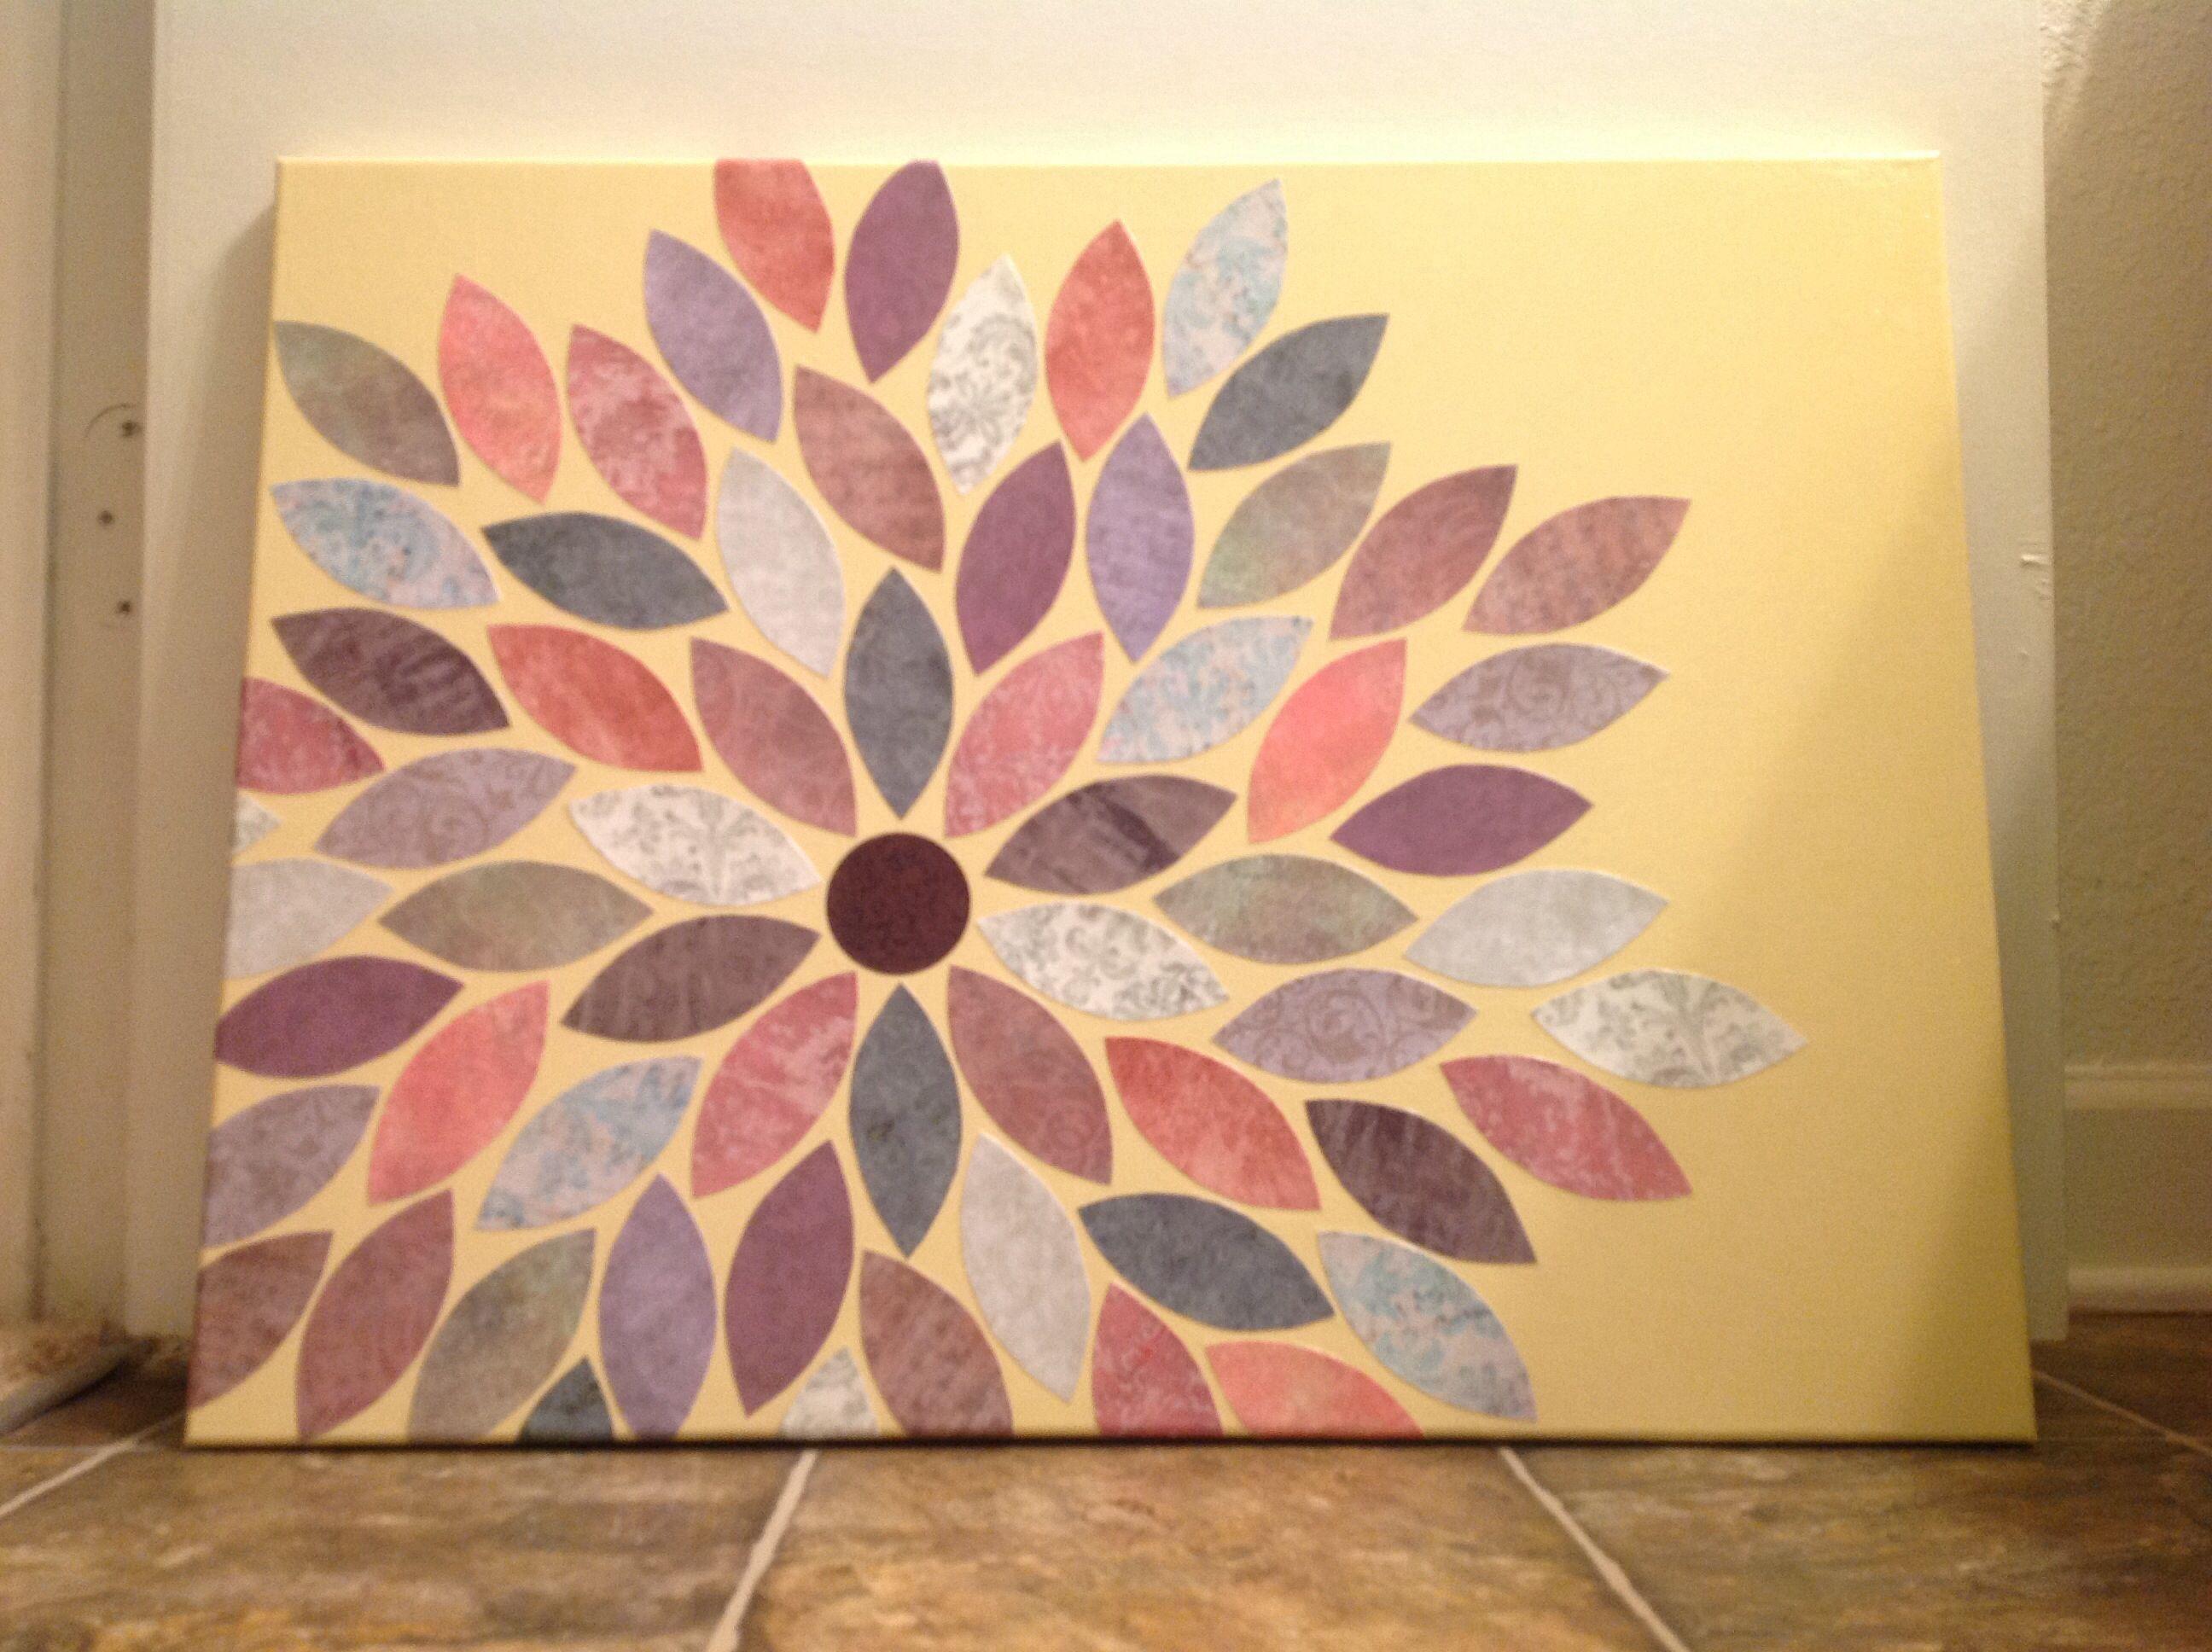 Diy canvas wall art wallart pinterest diy canvas craft and crafty